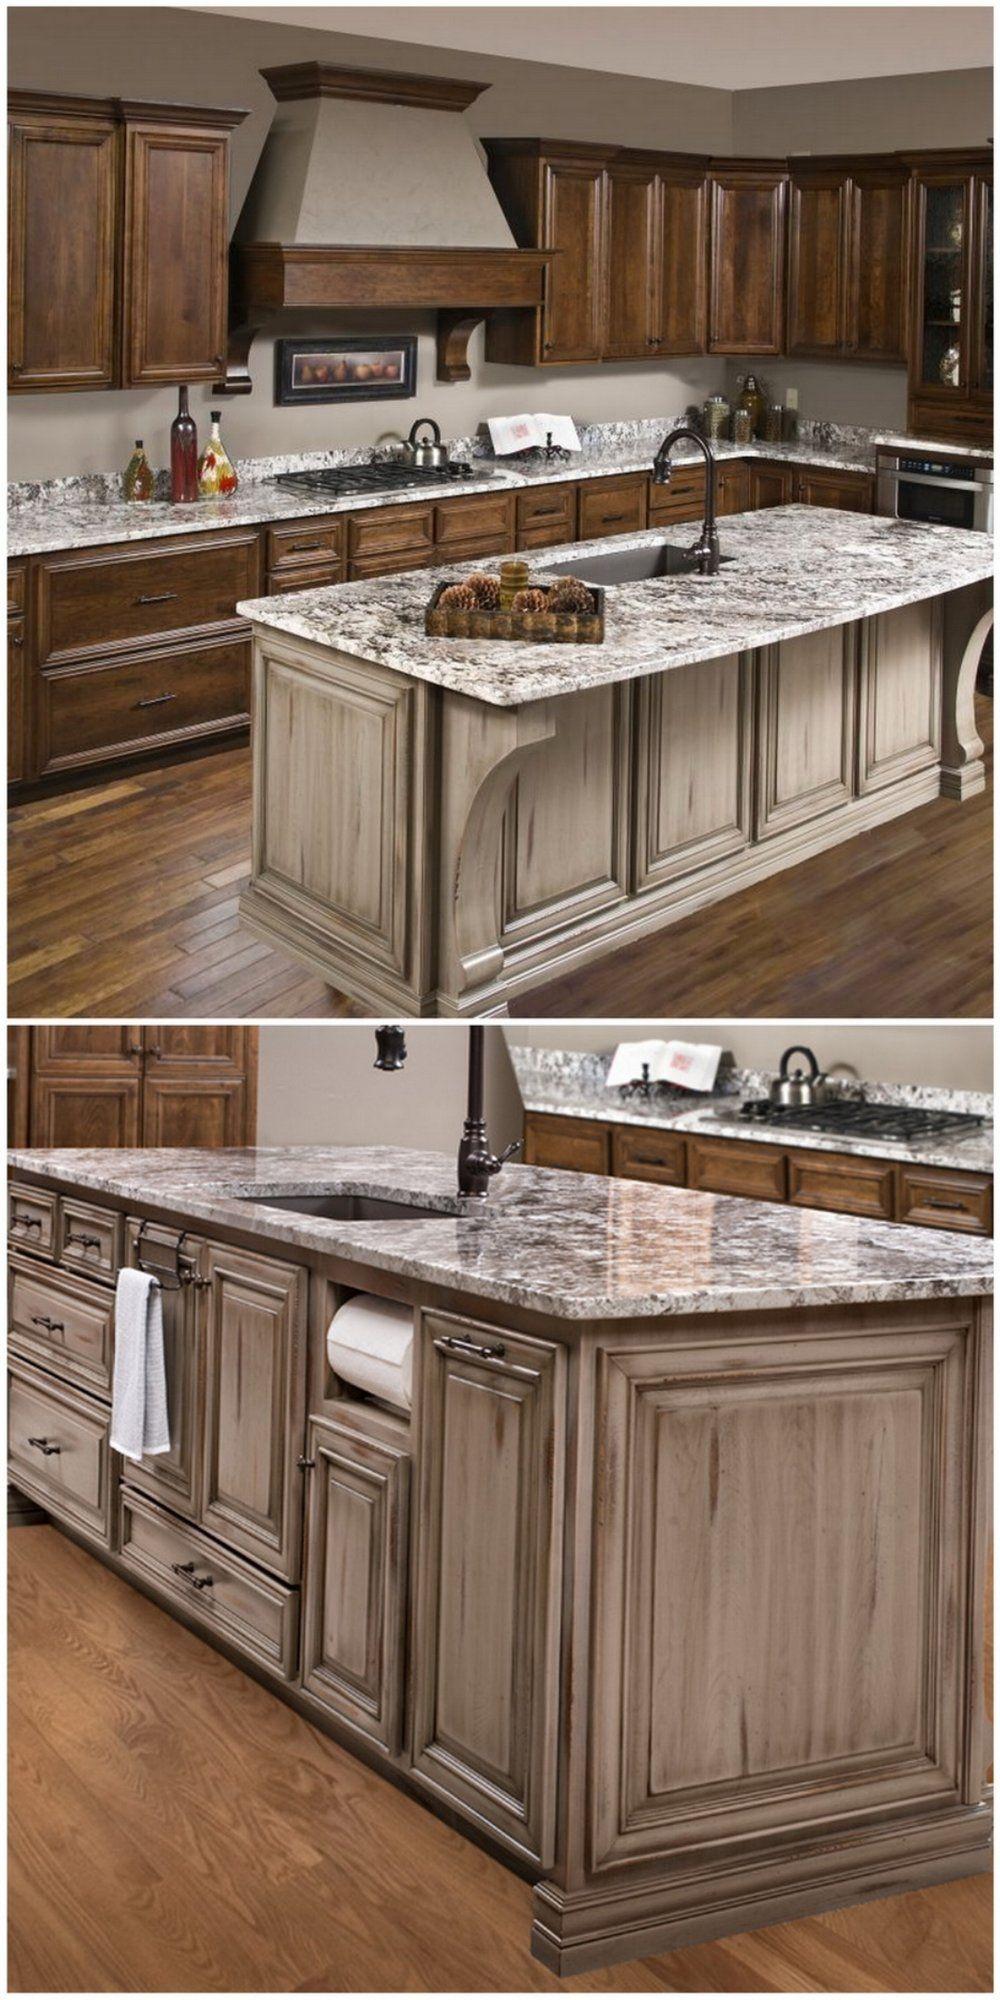 21 Gorgeous + Modern Kitchen Designs by Dakota   Cocinas, Decoración ...